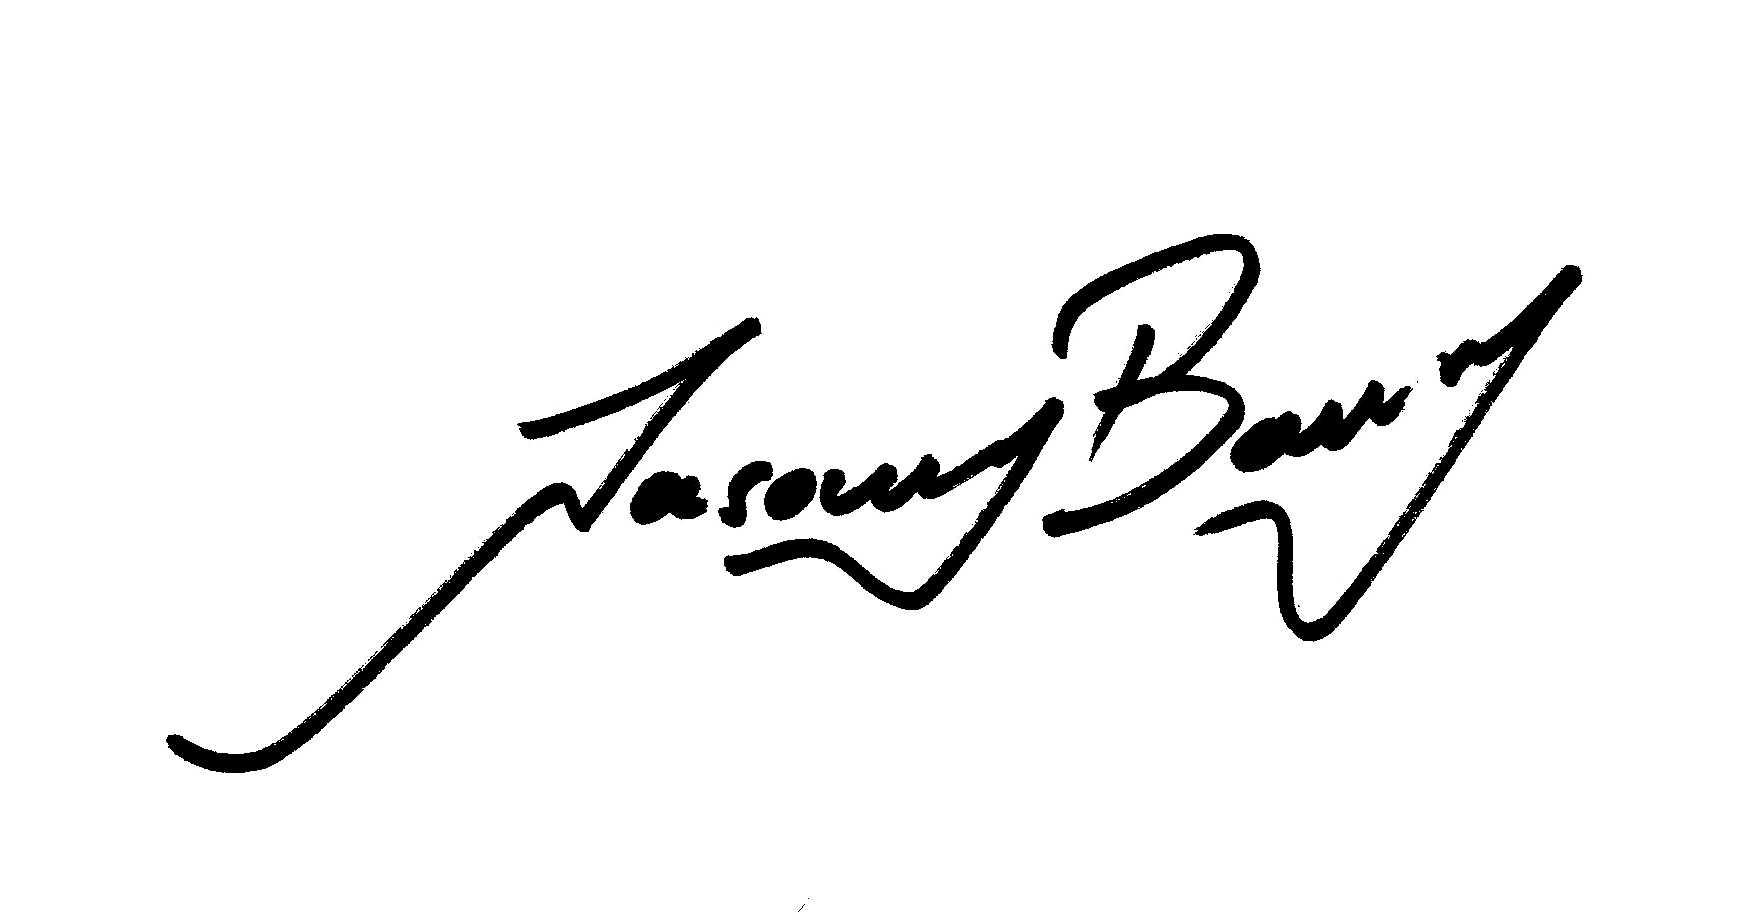 Iasonas Bakas artistic signature